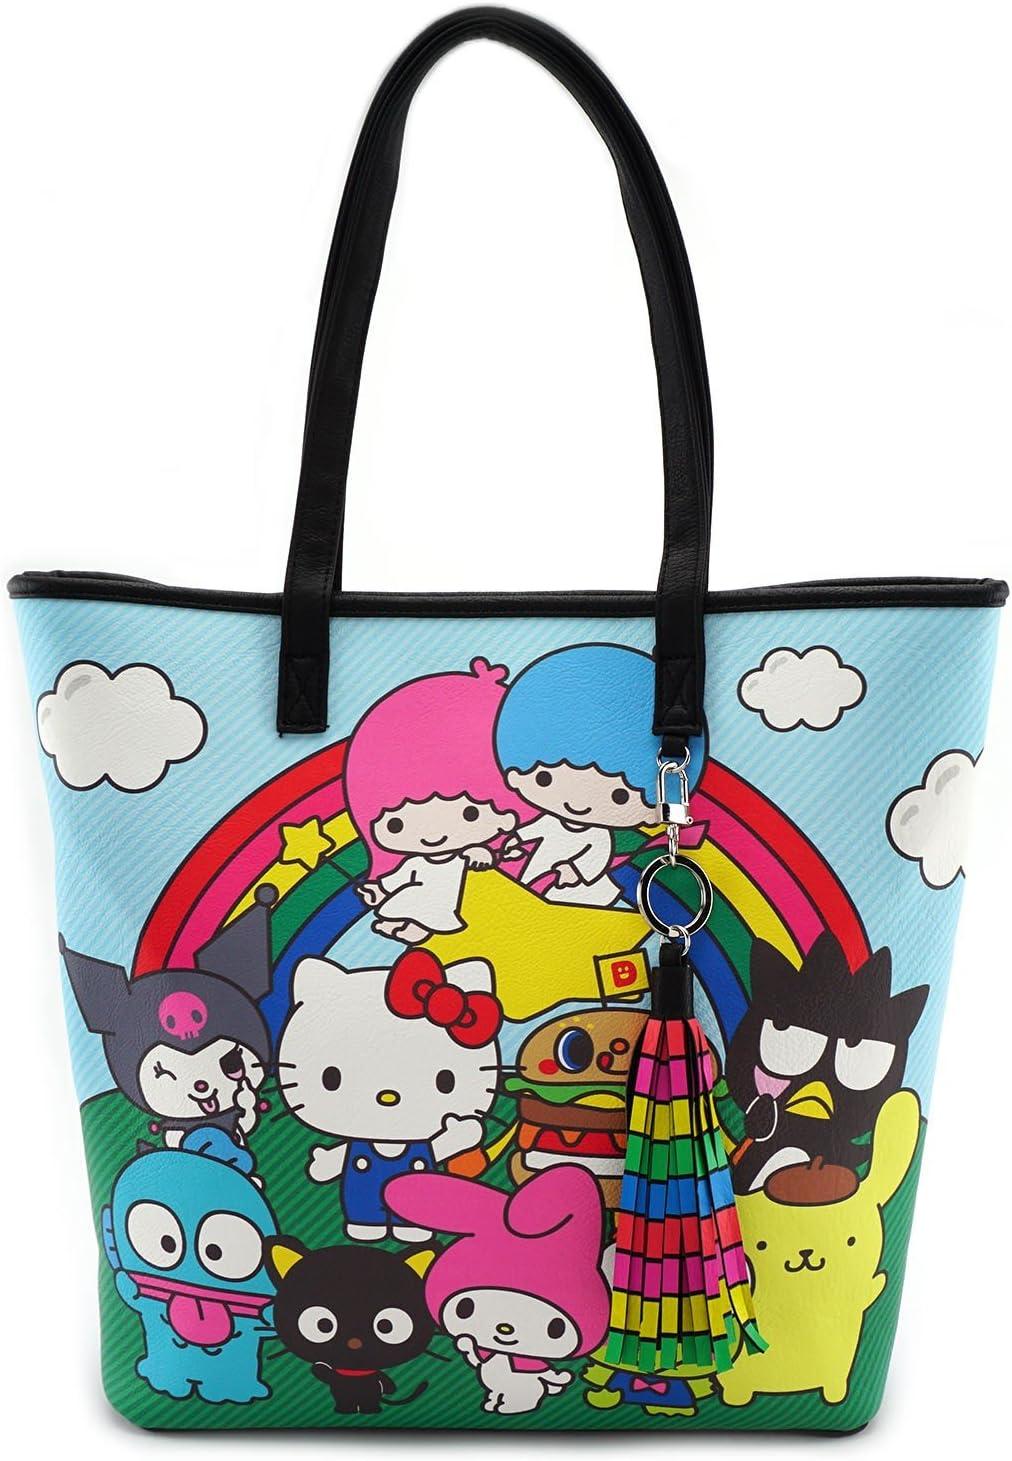 Loungefly x Hello Sanrio Characters//Rainbow Tote Bag